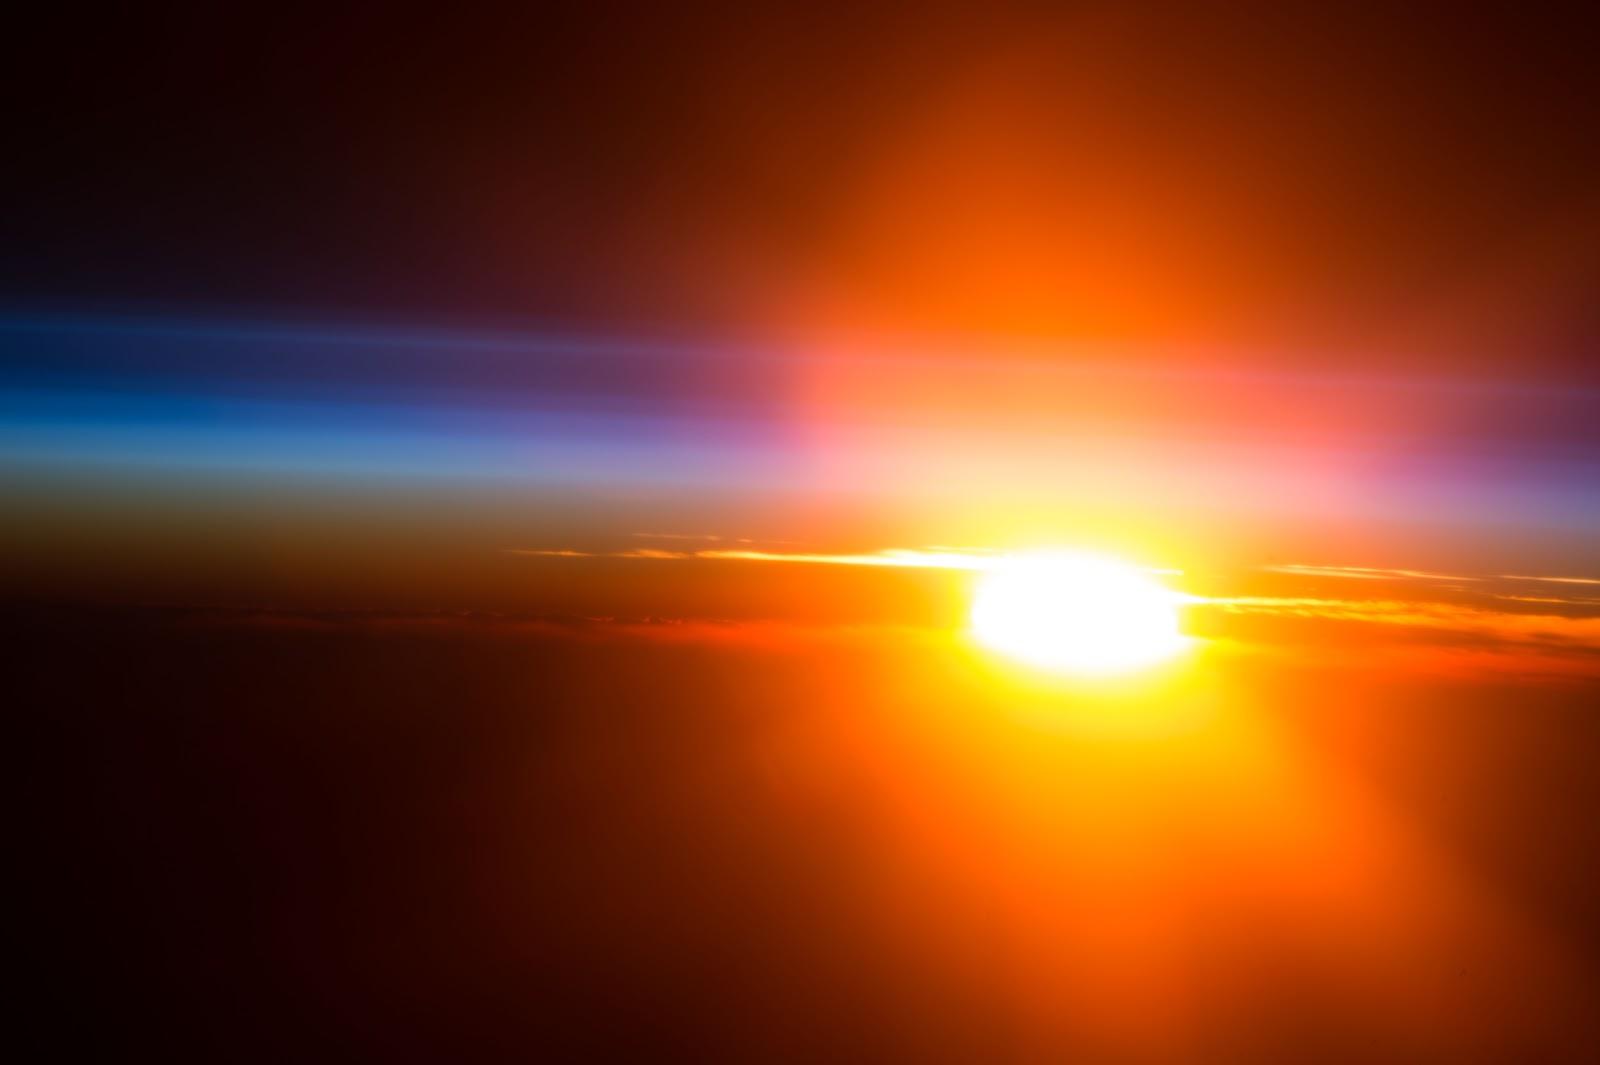 sunrise from international space station - photo #17